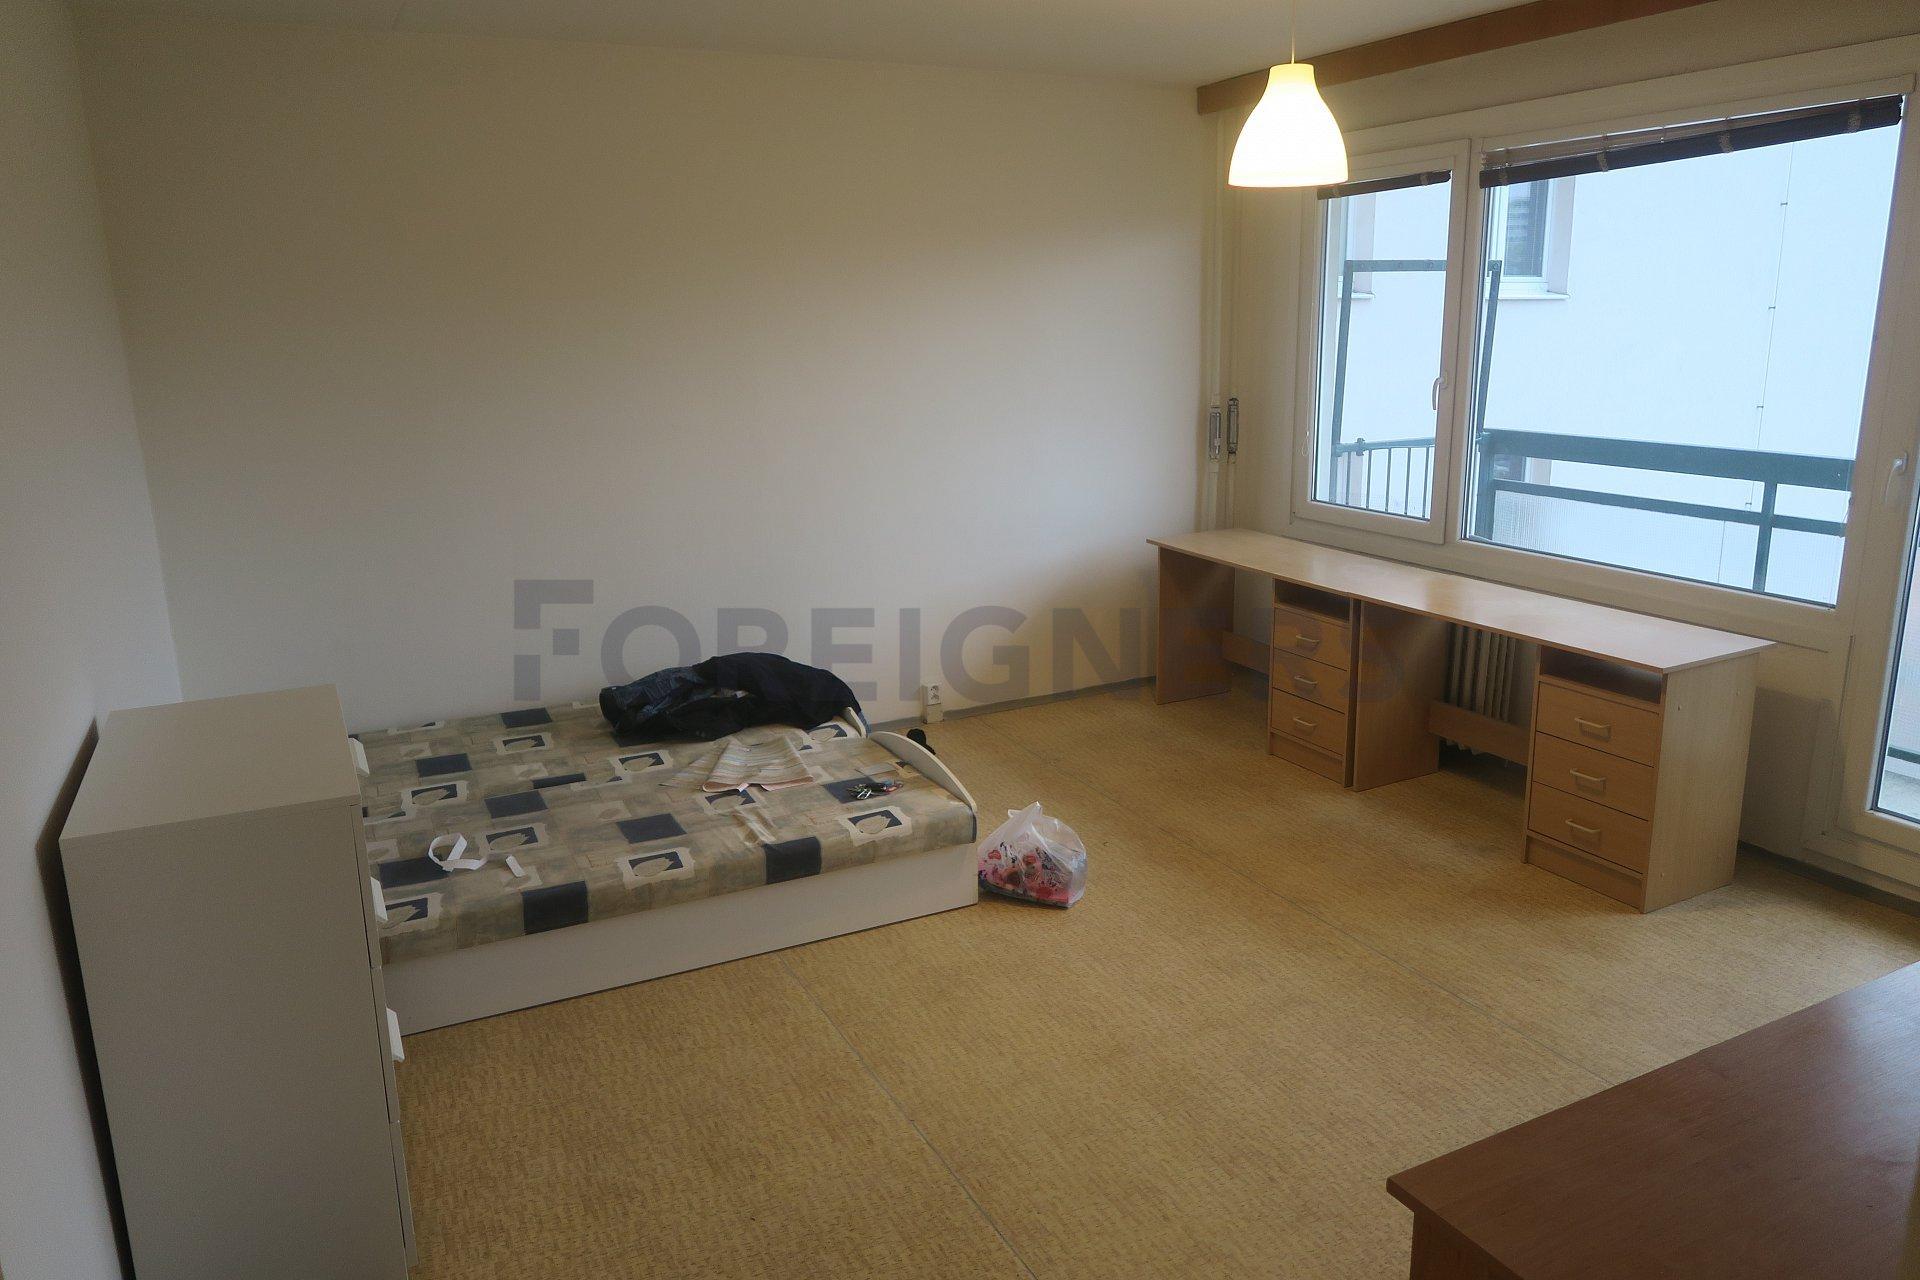 Terrific Room Pokoj Apartment For Rent In Brno Foreigners Cz Download Free Architecture Designs Jebrpmadebymaigaardcom